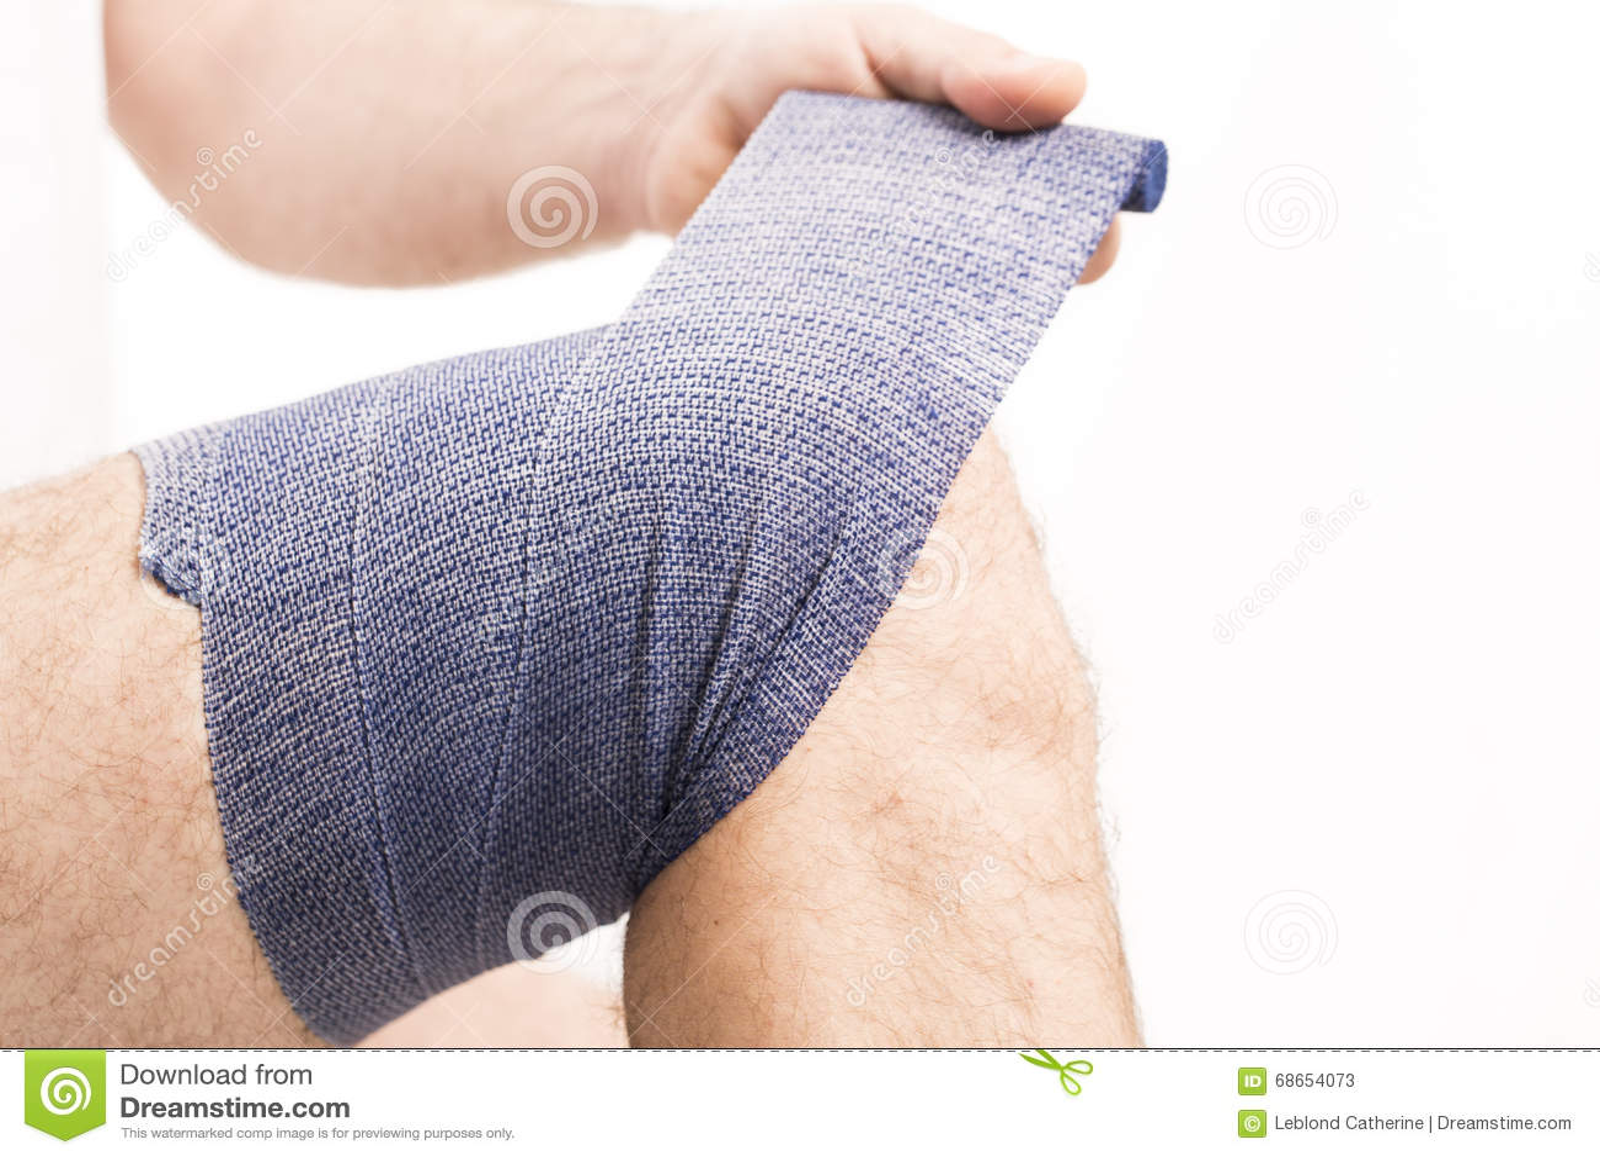 Man Elastic Bandage On Knee Stock Image Image Of Healthy Joint